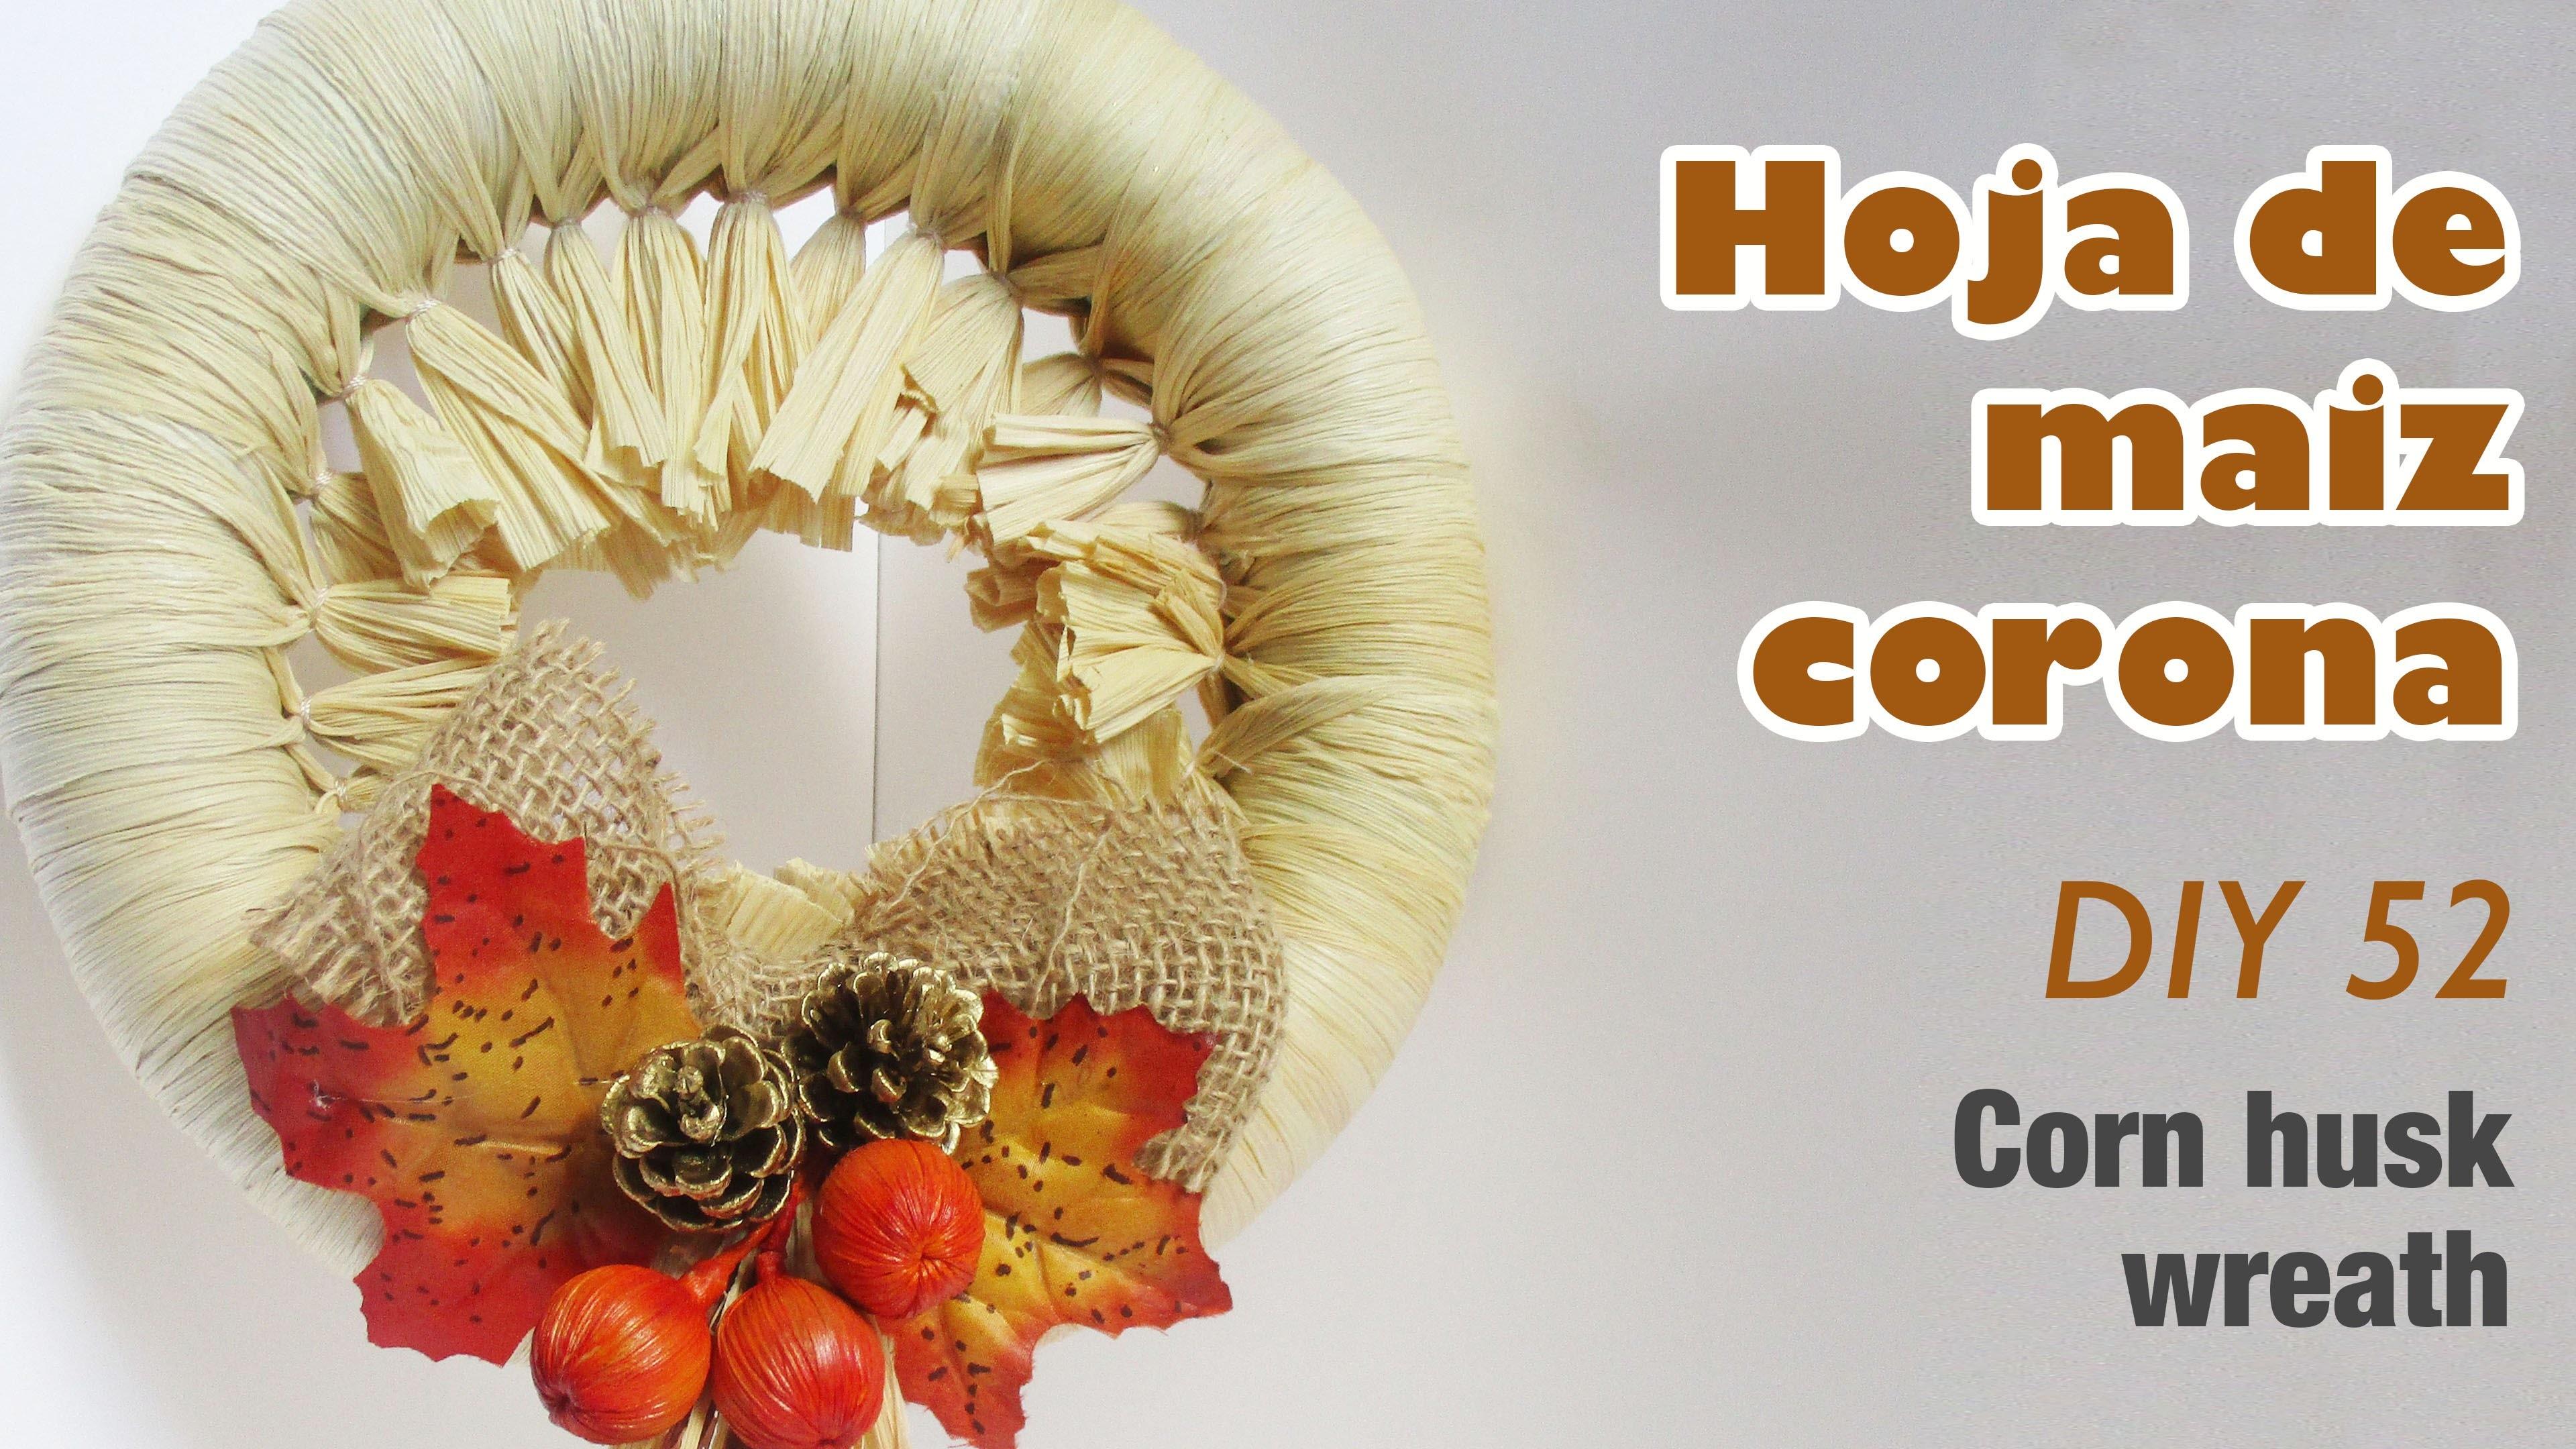 Como hacer corona de hoja de maiz 52.How to make corn husk wreath